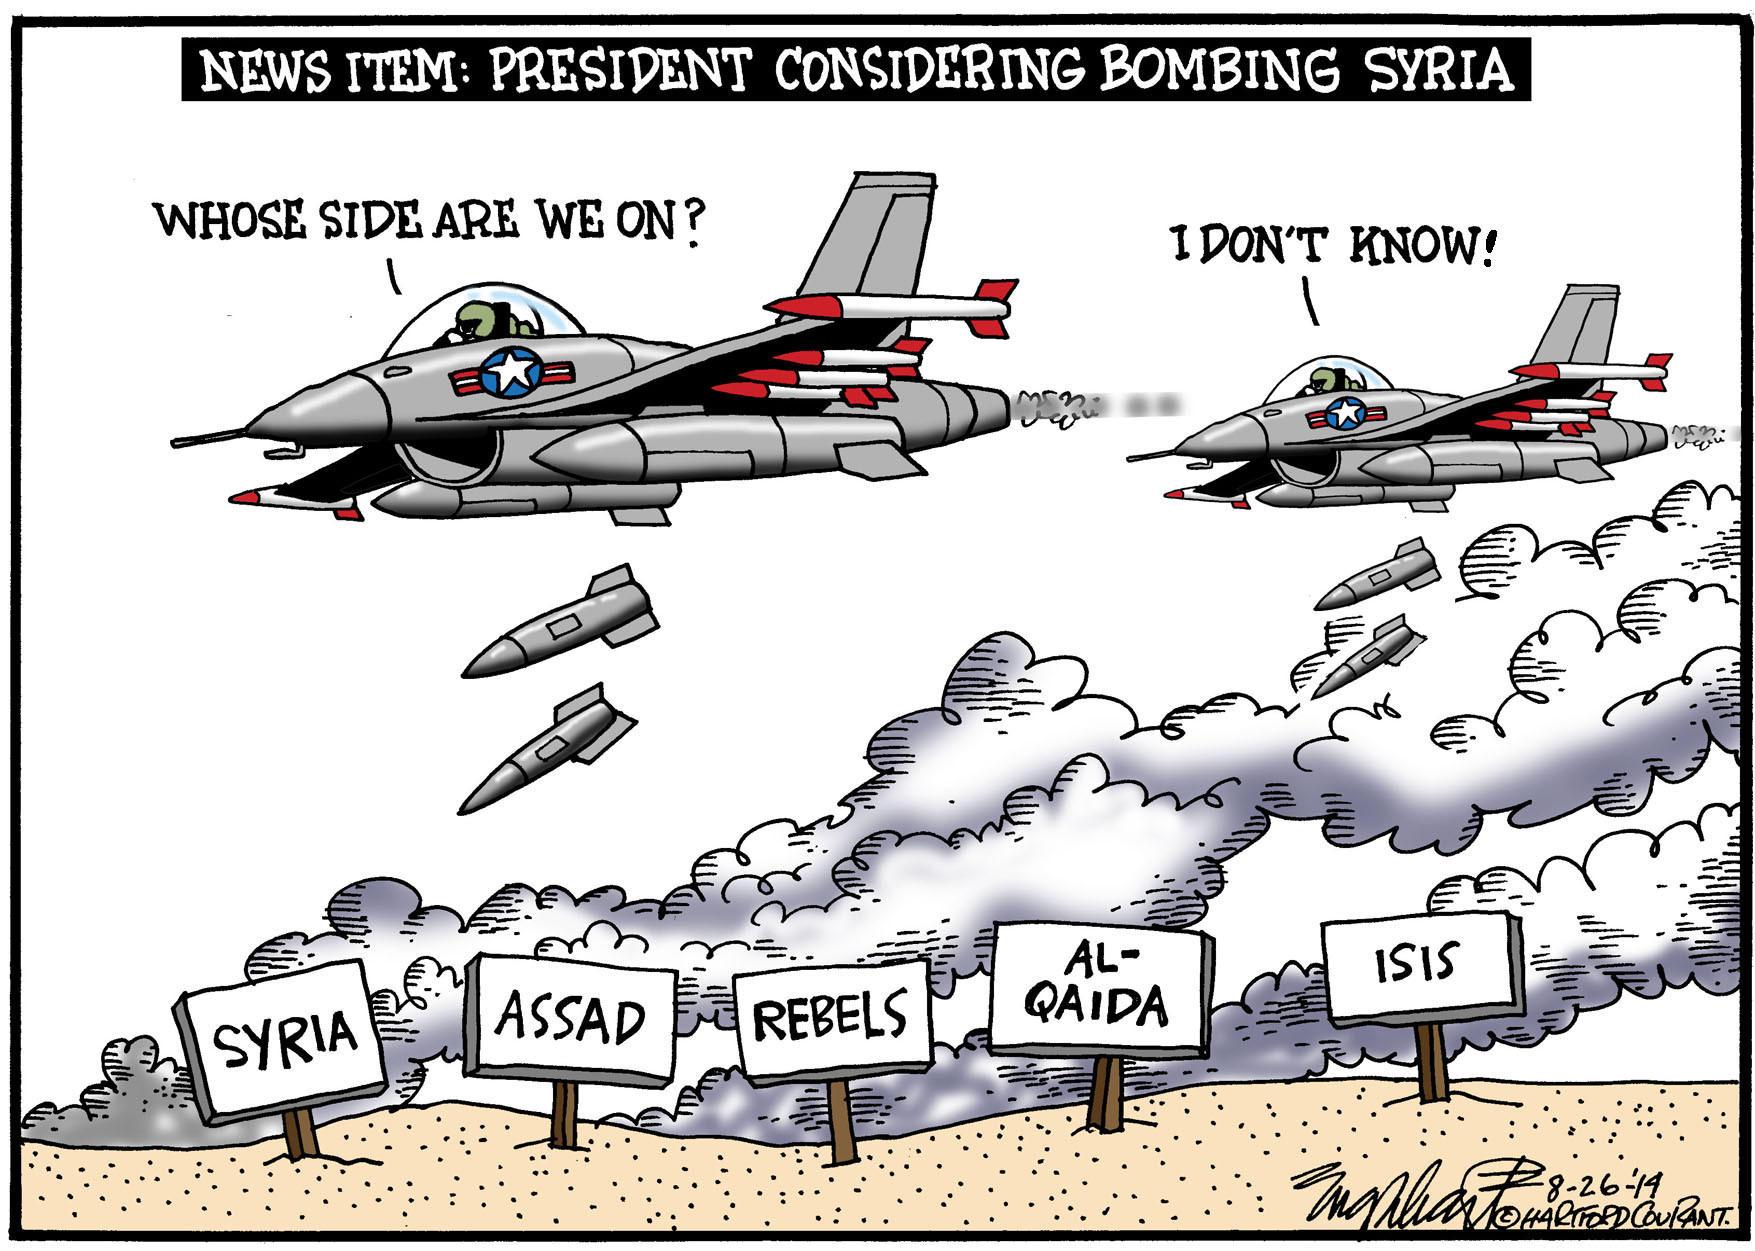 http://www.trbimg.com/img-53fb9501/turbine/hc-bombing-syria-isis-20140825-001/1755/1755x1251